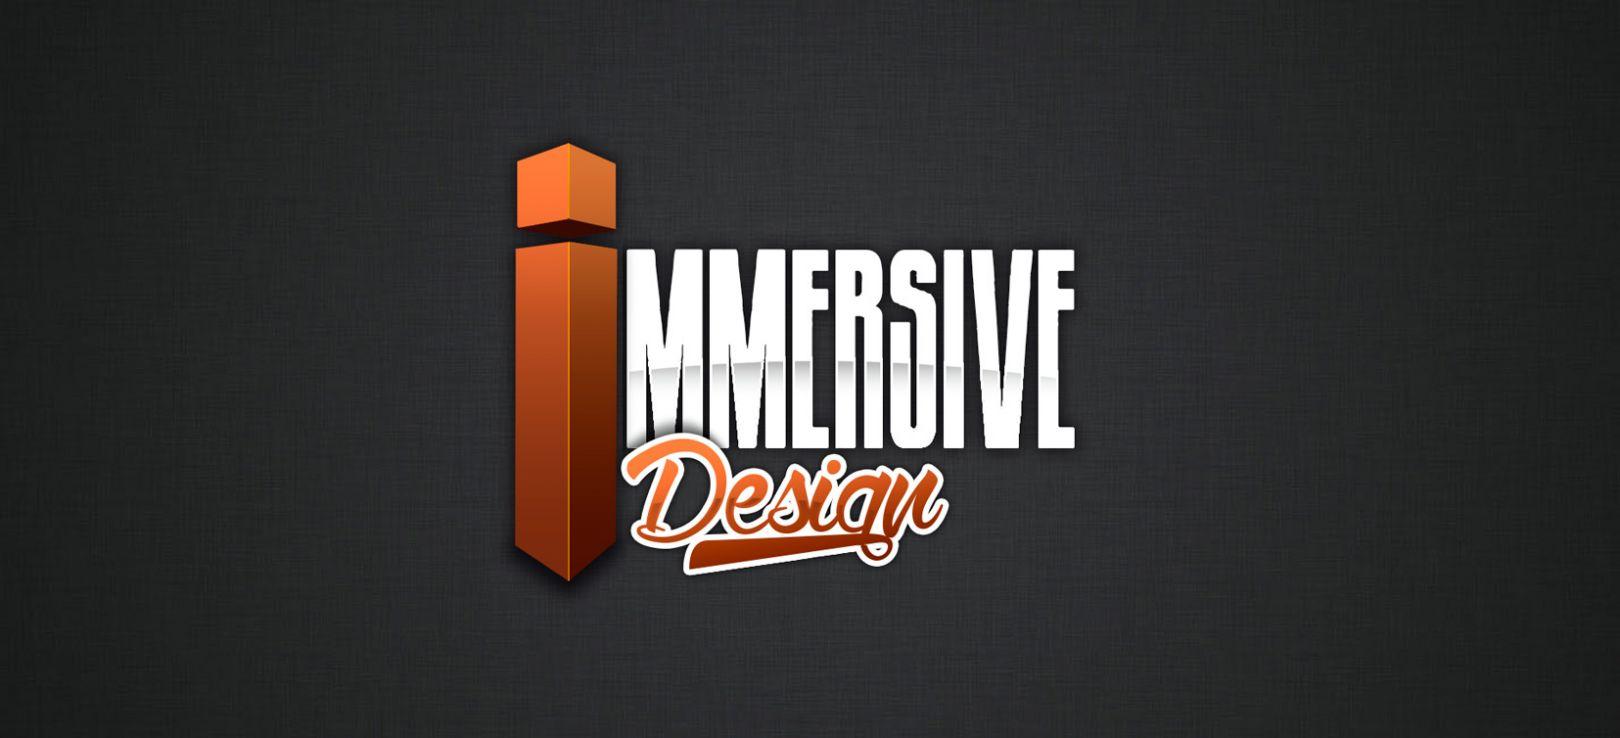 Logo Immersive Design